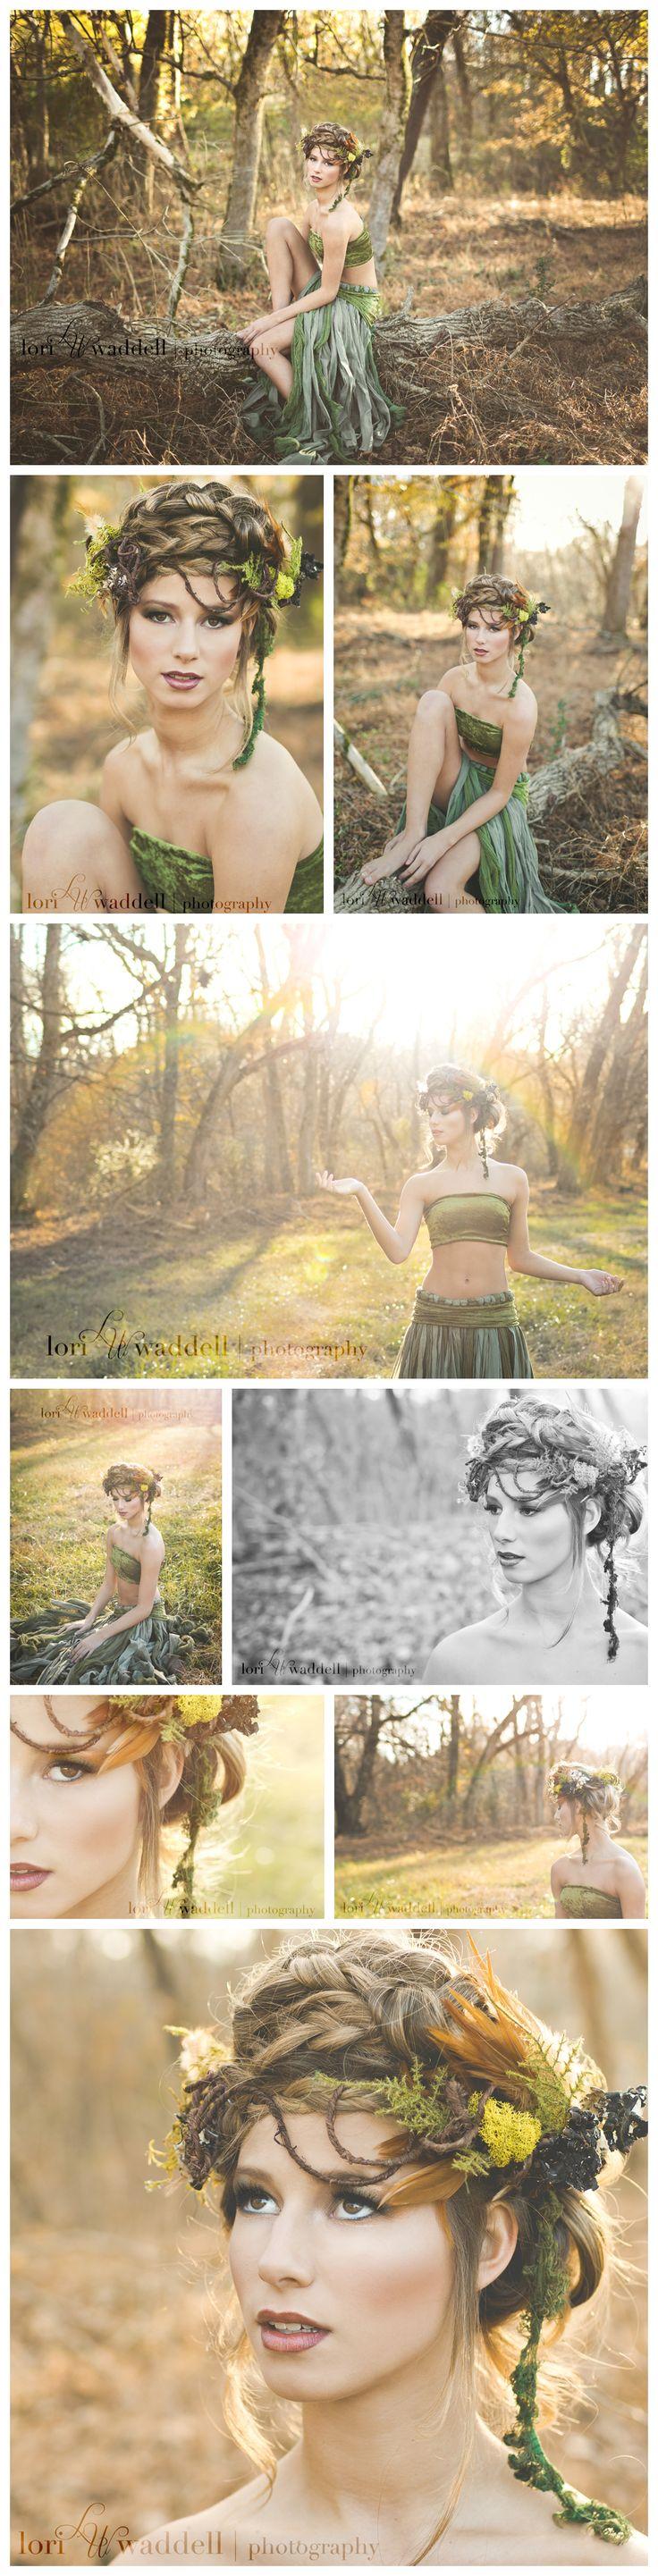 Concept Photographer Atlanta, Styled photo session Atlanta   Marietta,   Atlanta Marietta Photographer